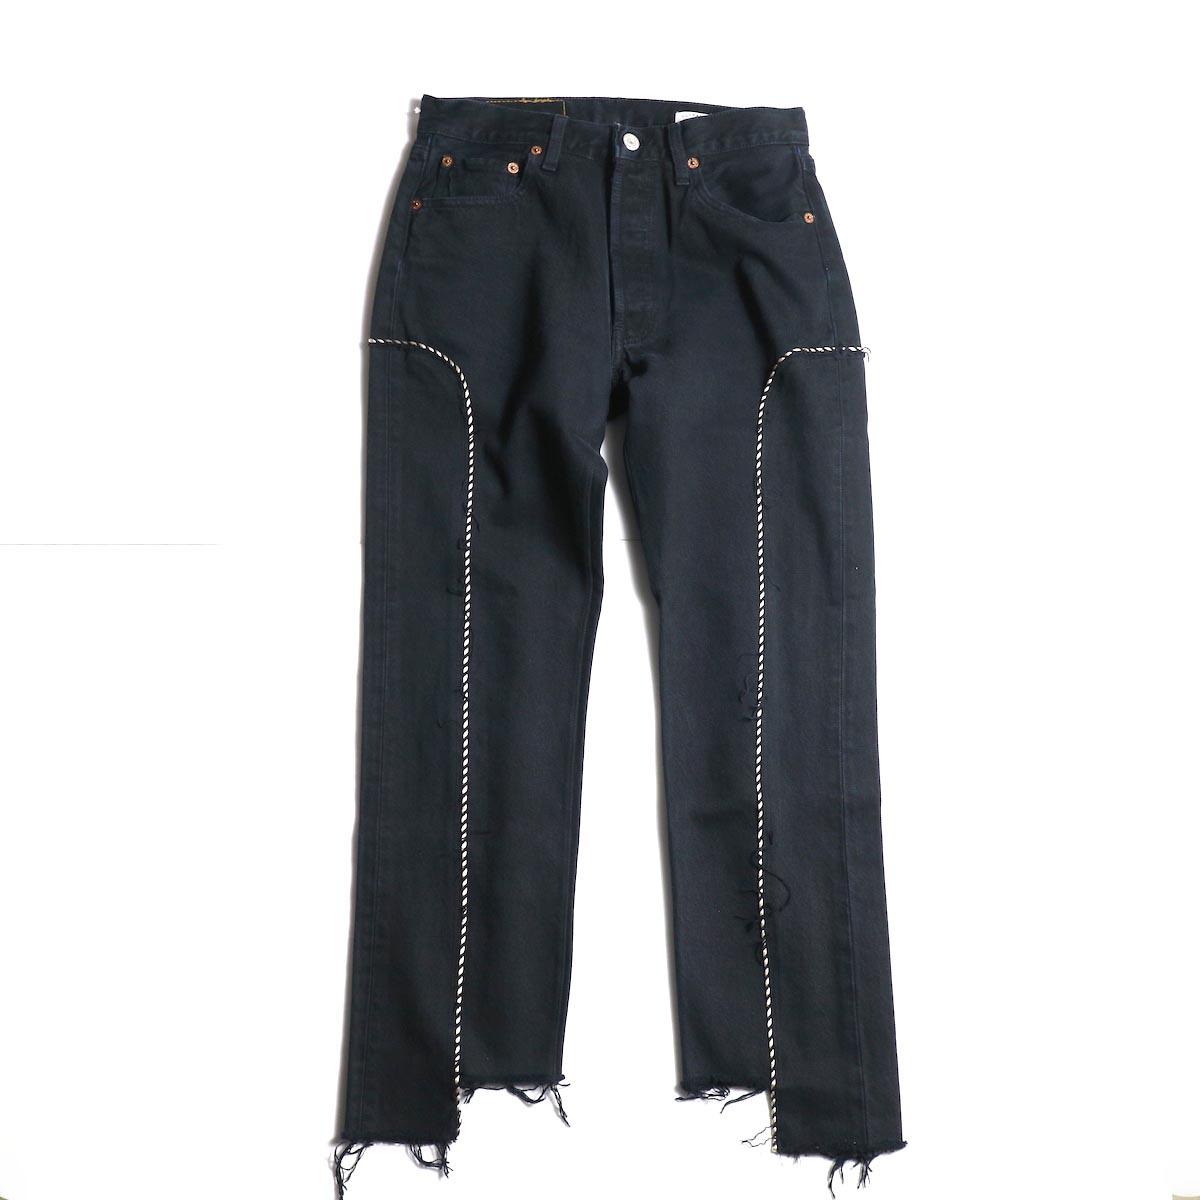 OLD PARK / Western Jeans (Black) (Ssize-A)